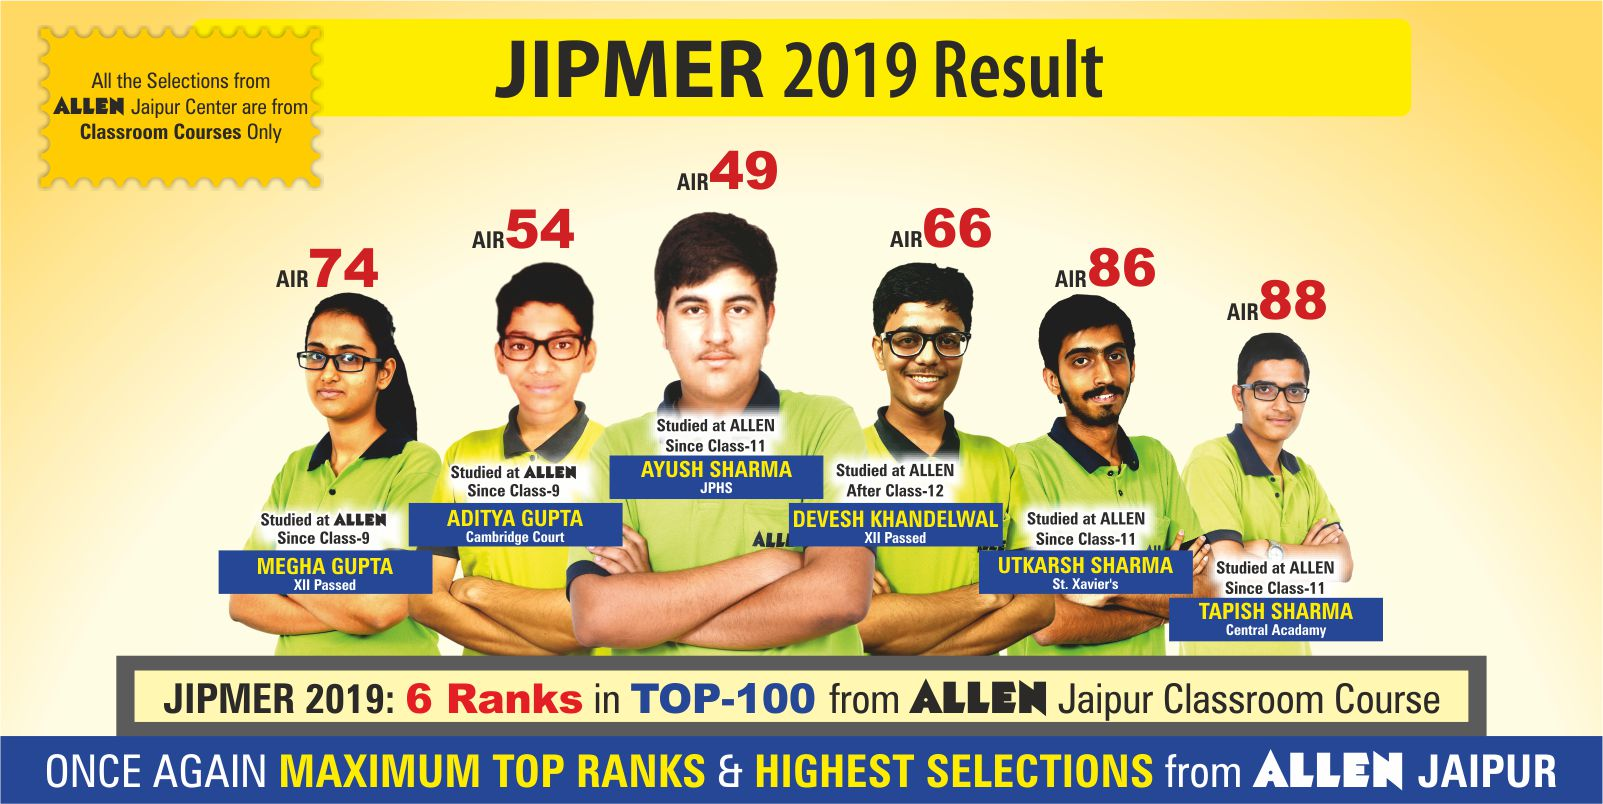 JIPMER-2019